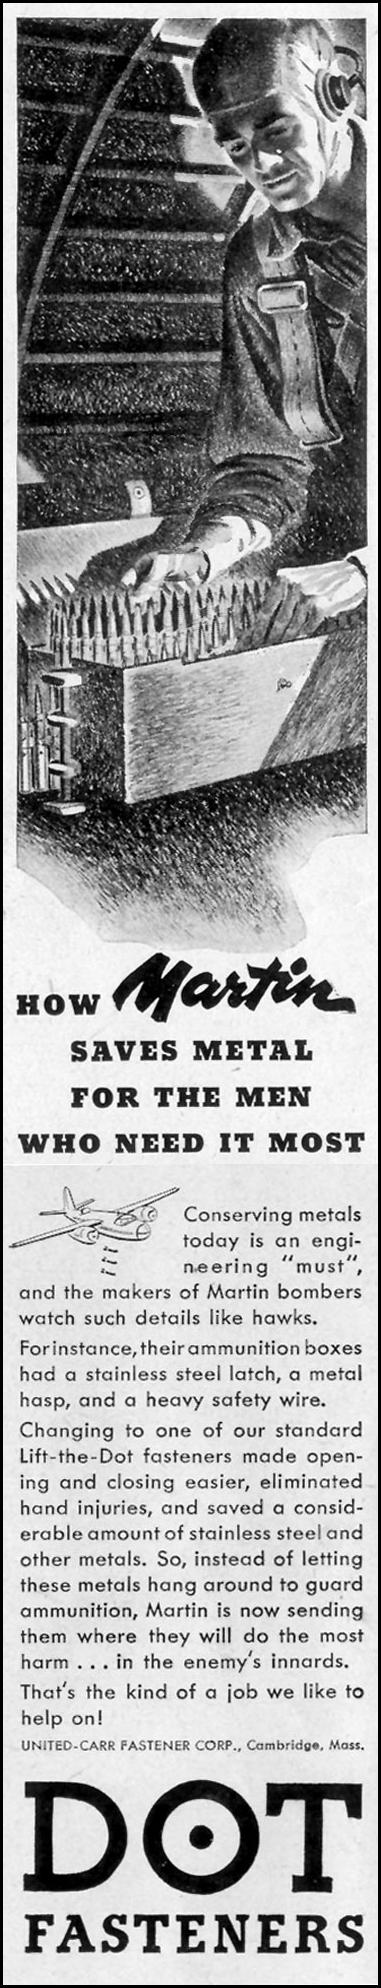 DOT FASTENERS LIFE 11/08/1943 p. 2